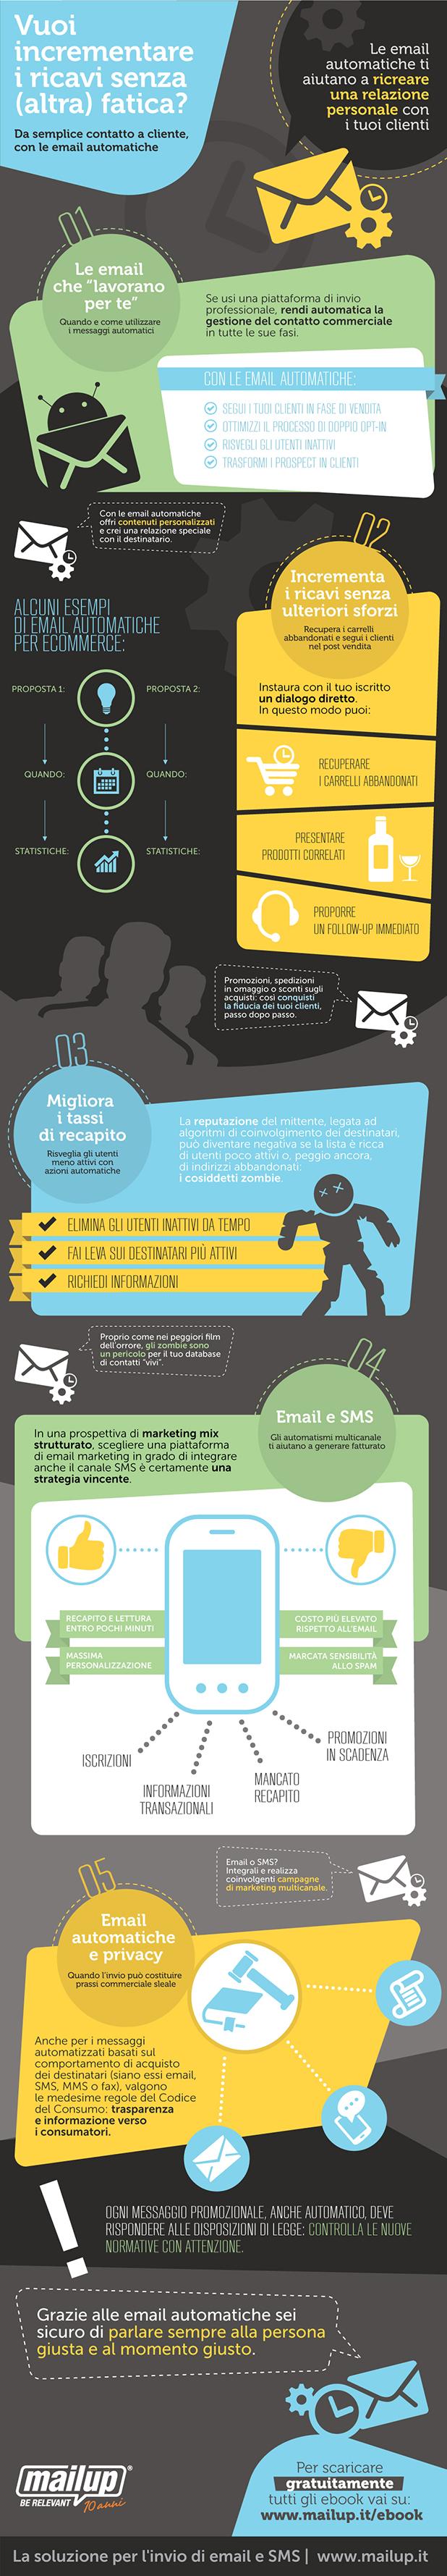 email-automatiche-5-consigli-mailup